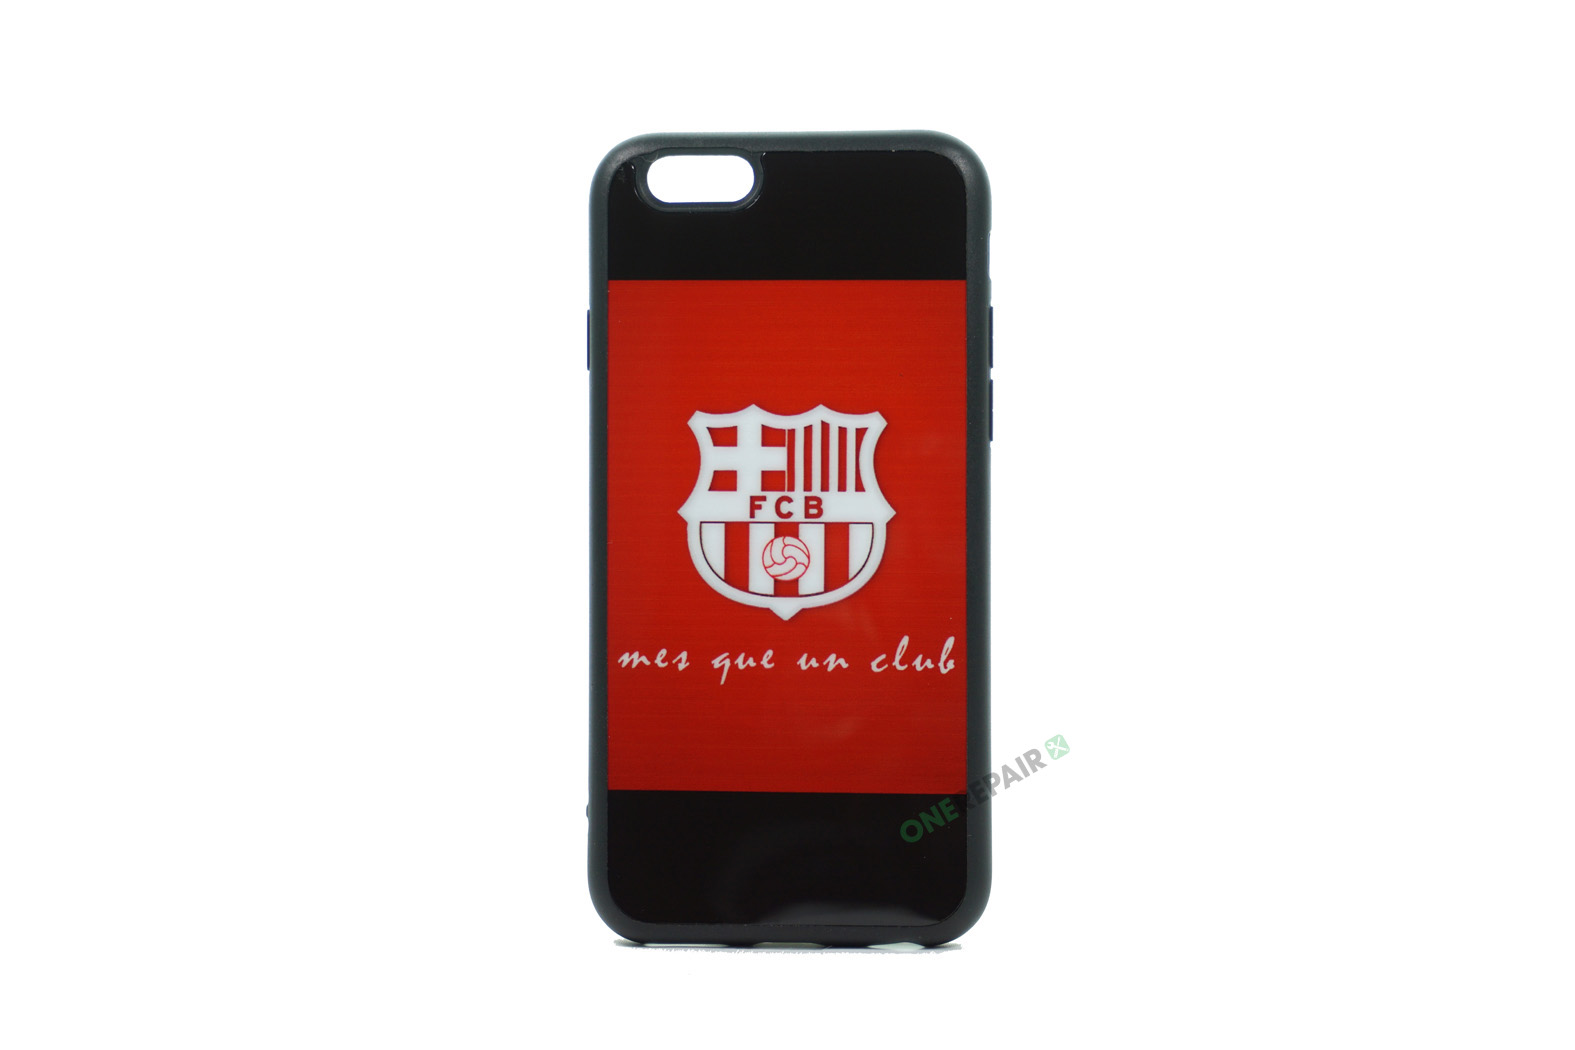 iPhone 6, 6S, A1549, A1586, A1589, A1633, A1688, A1700, A1691, Apple, Bagcover, Cover, Billig, Motiv, Fodbold, Klub, Barcelona, FC, Rød, Roed